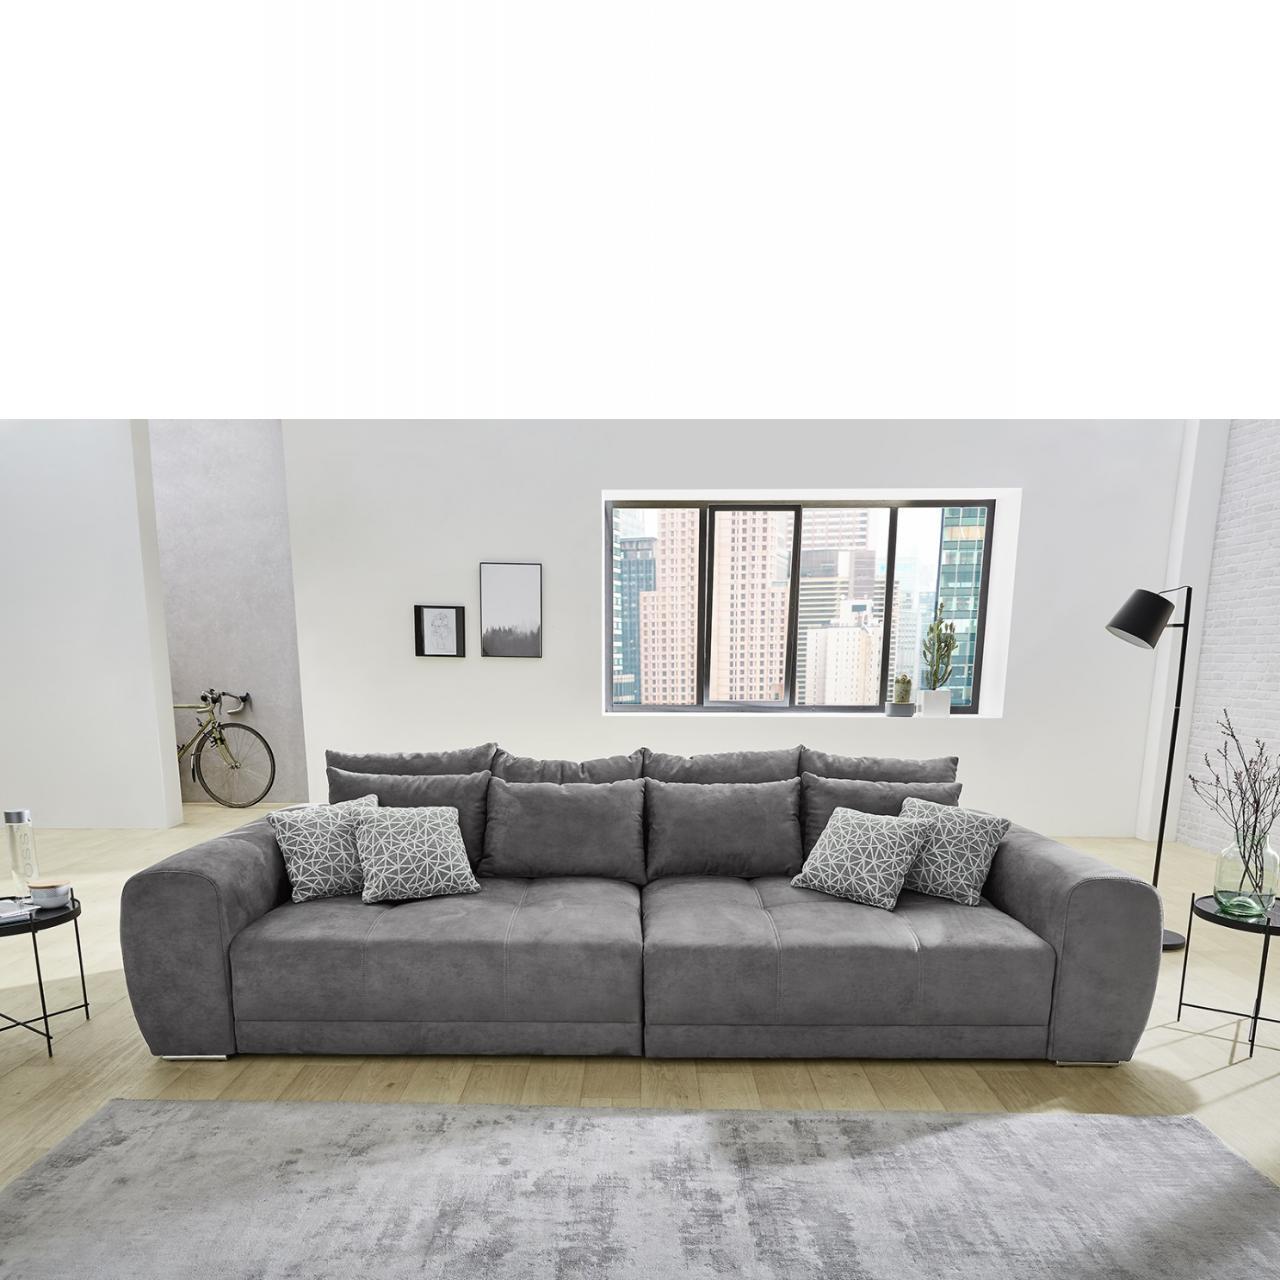 Big Sofa Sam In Grau Inkl Kissen Wohnlandschaft Polstermöbel